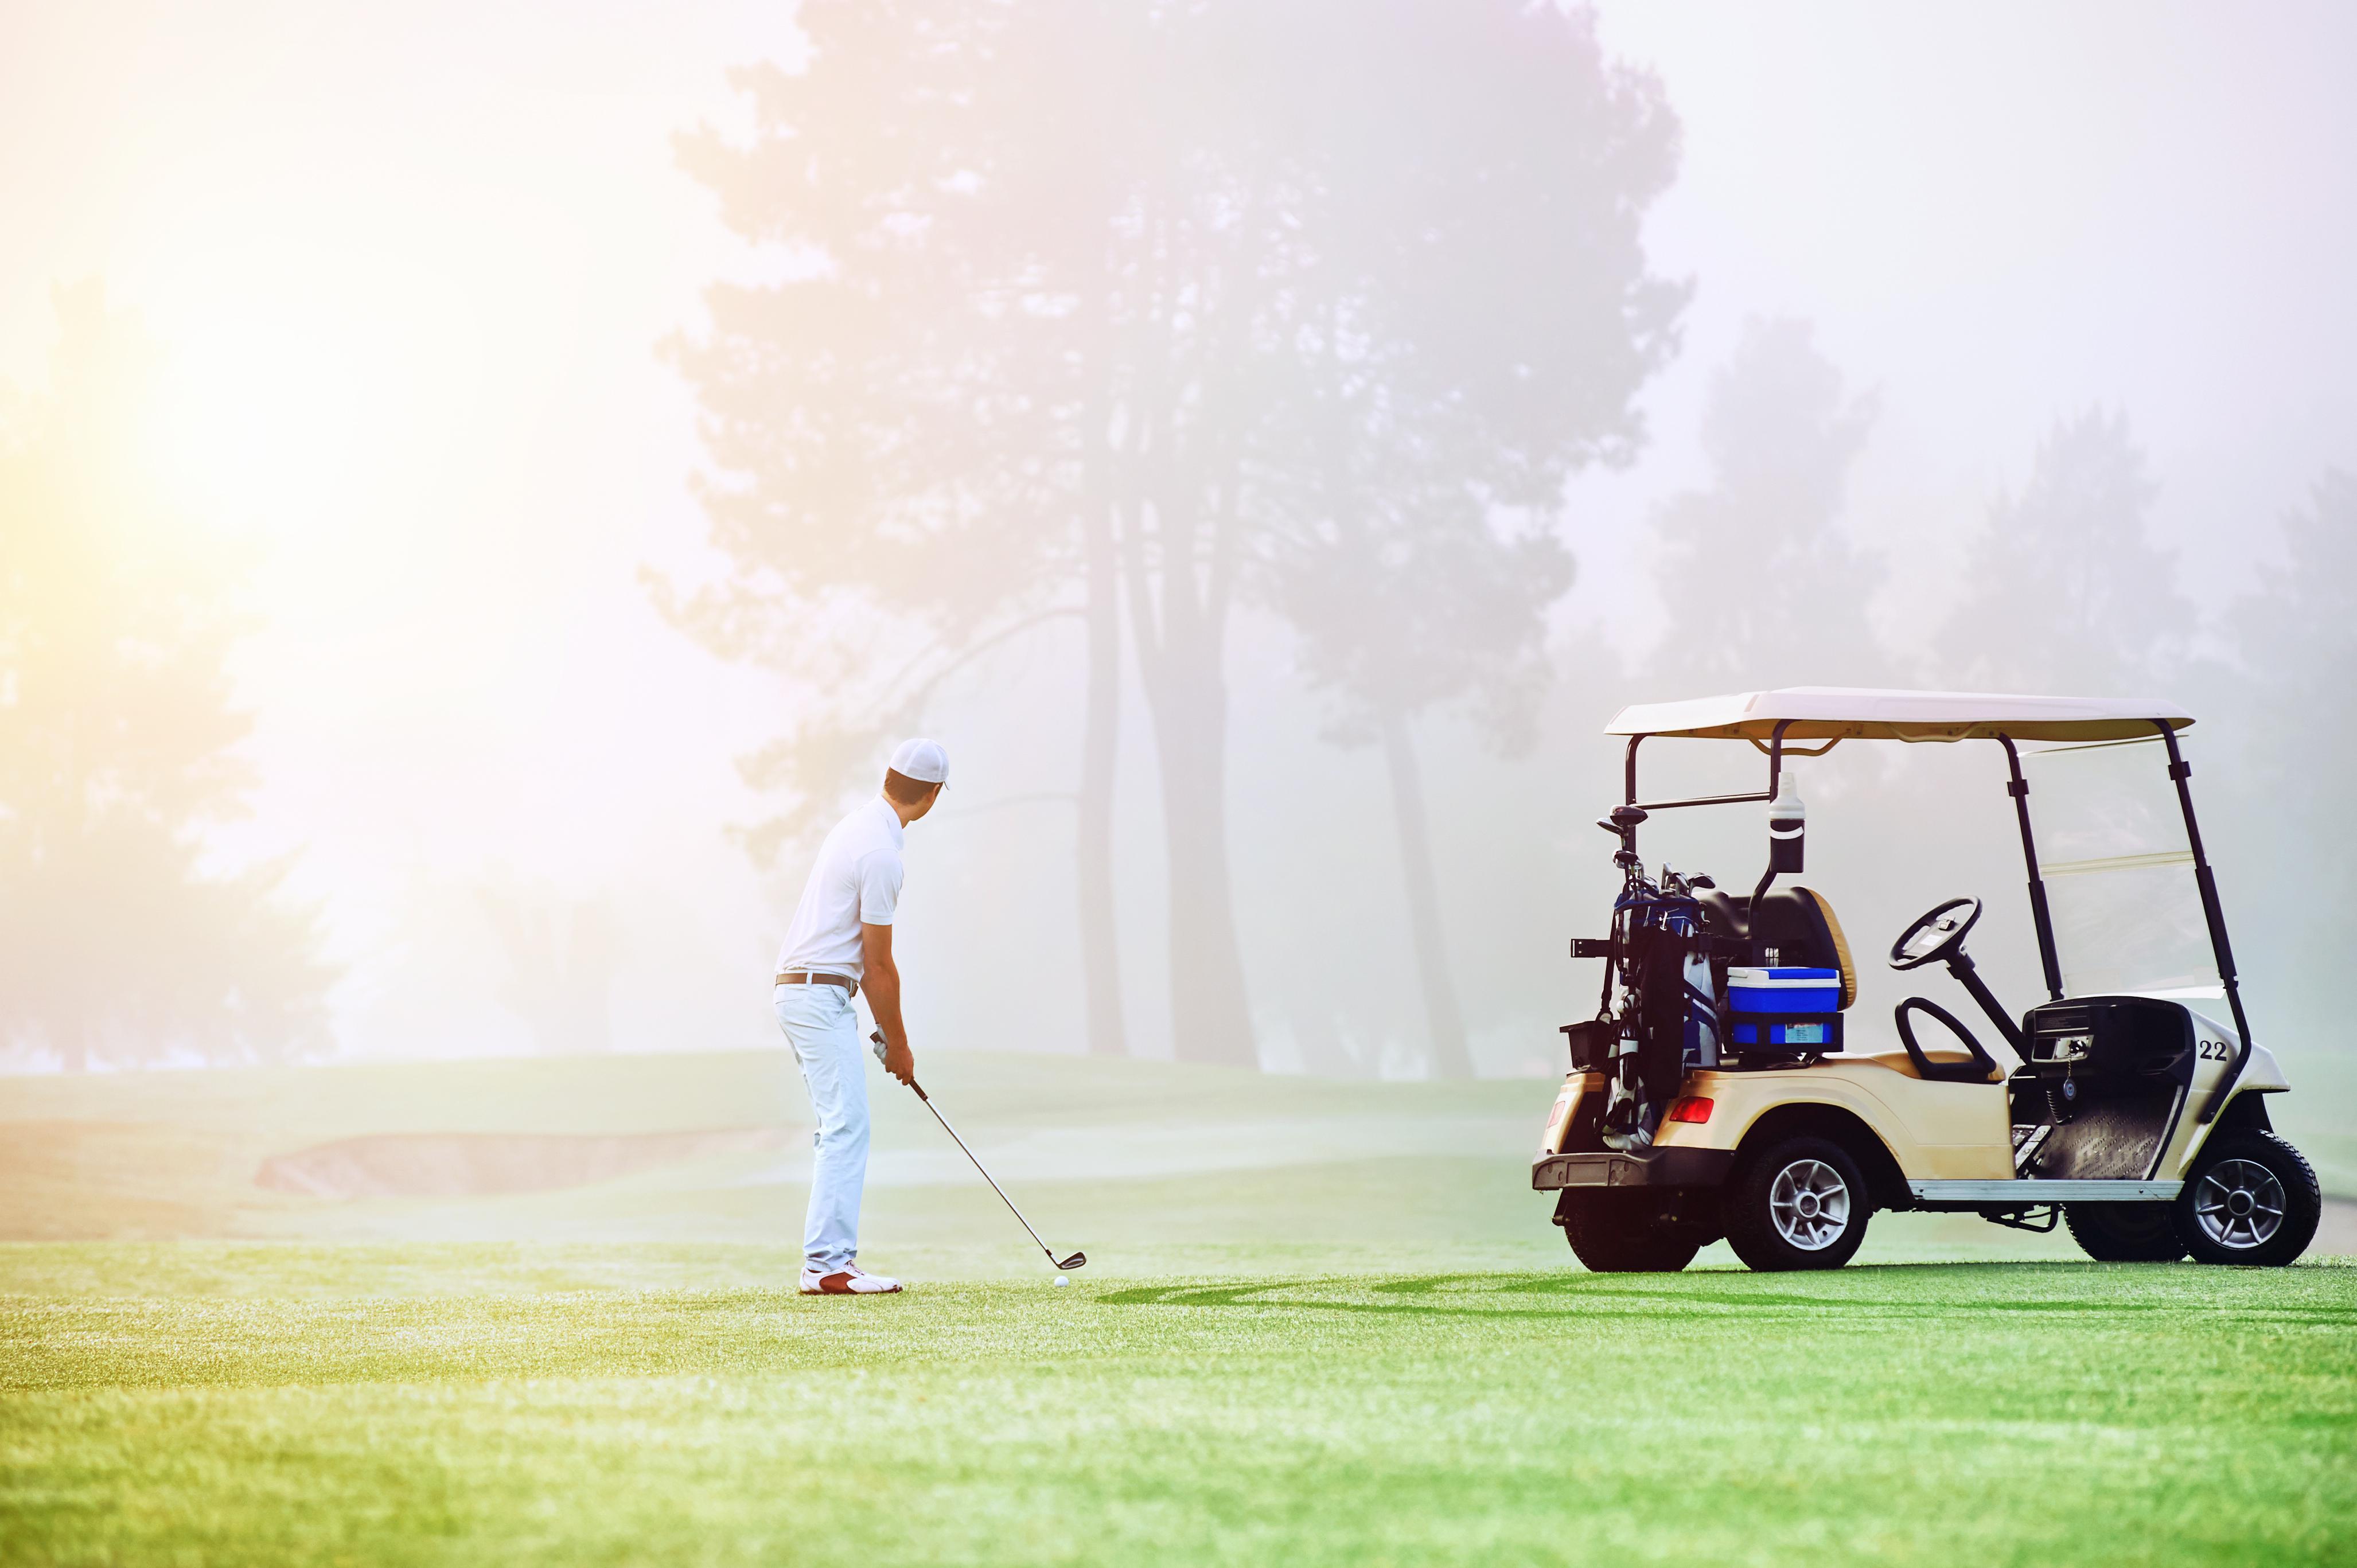 Nanshan International Golf Club